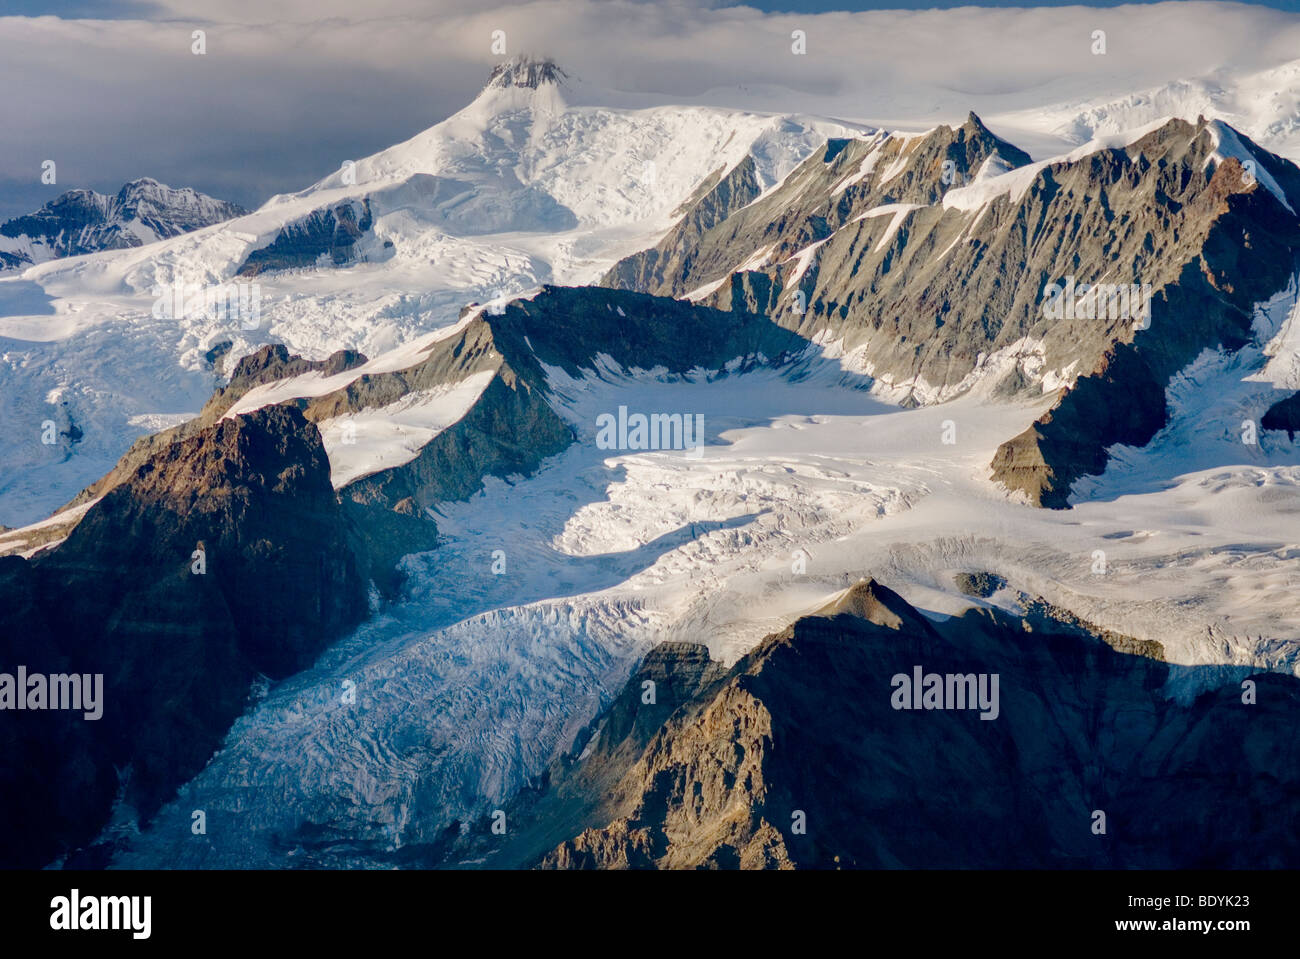 Aerial view of the Mount Blackburn Regal Mountain glacial complex, Wrangell-St. Elias National Park Alaska - Stock Image